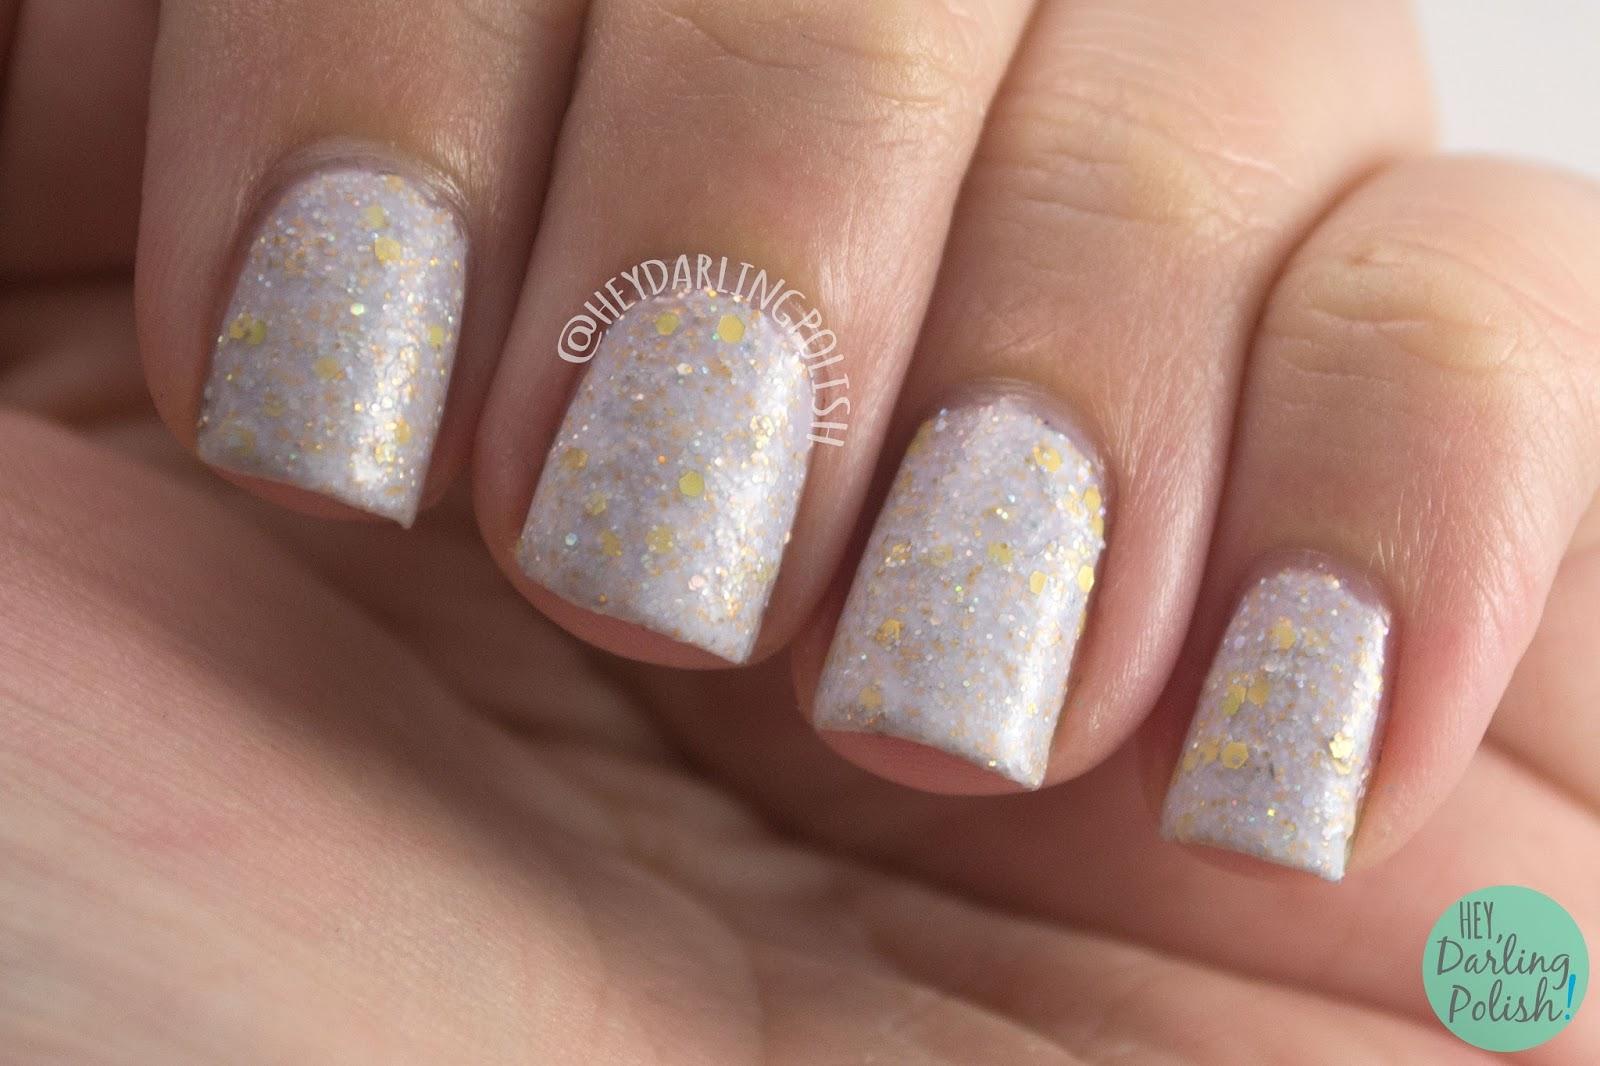 cream, white, olaf's snowflower, gold, glitter, glitter crelly, nails, nail polish, indie polish, indie nail polish, hey darling polish, black dahlia lacquer,